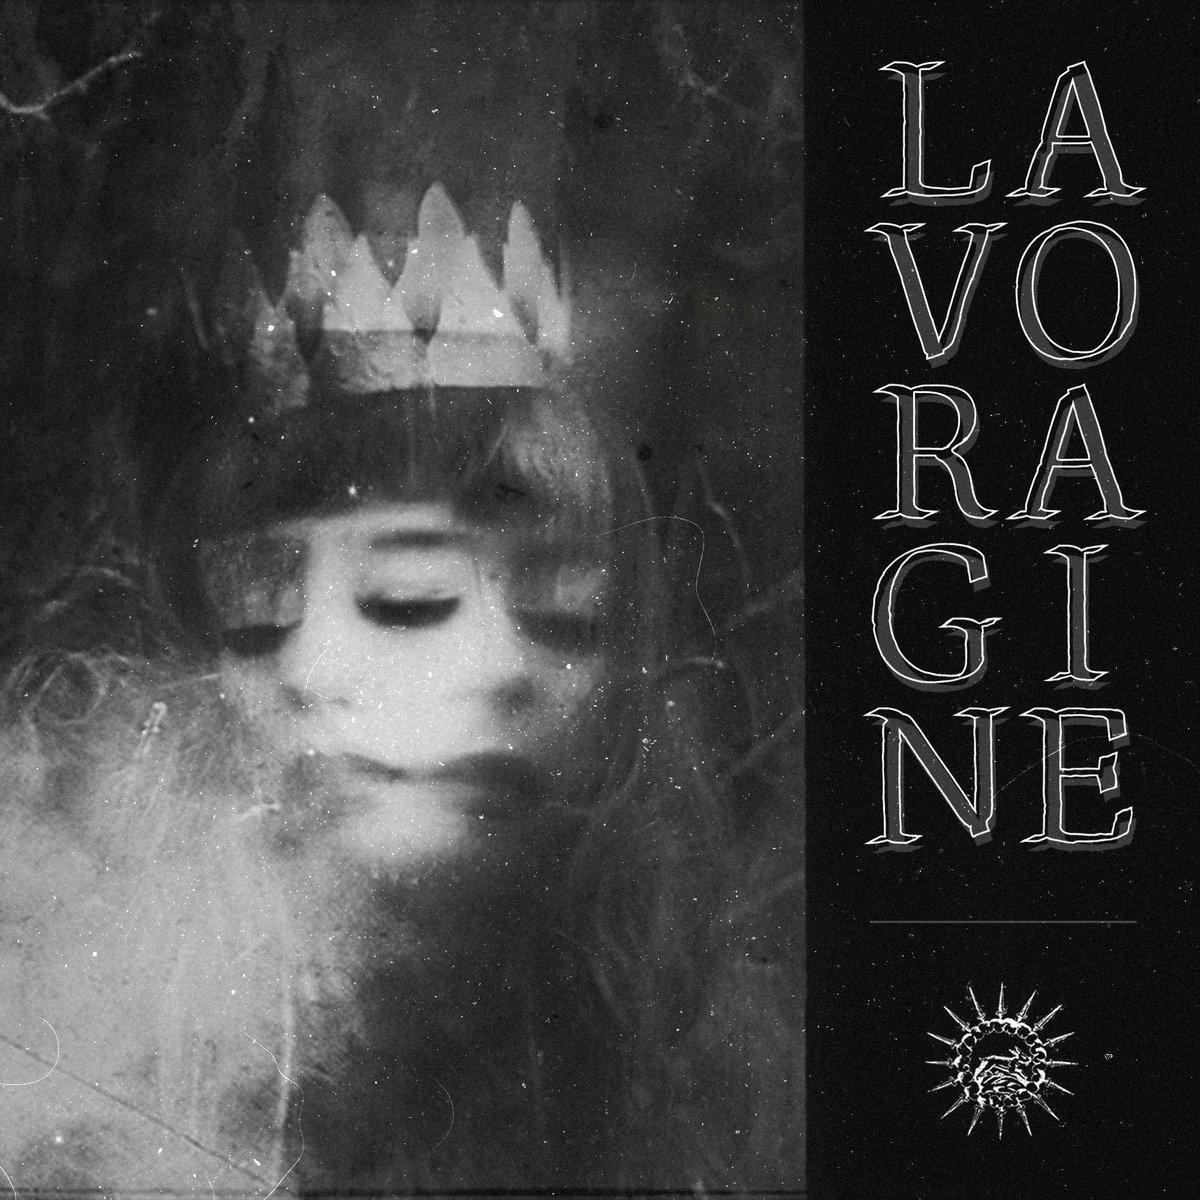 La Voragine – La Voragine